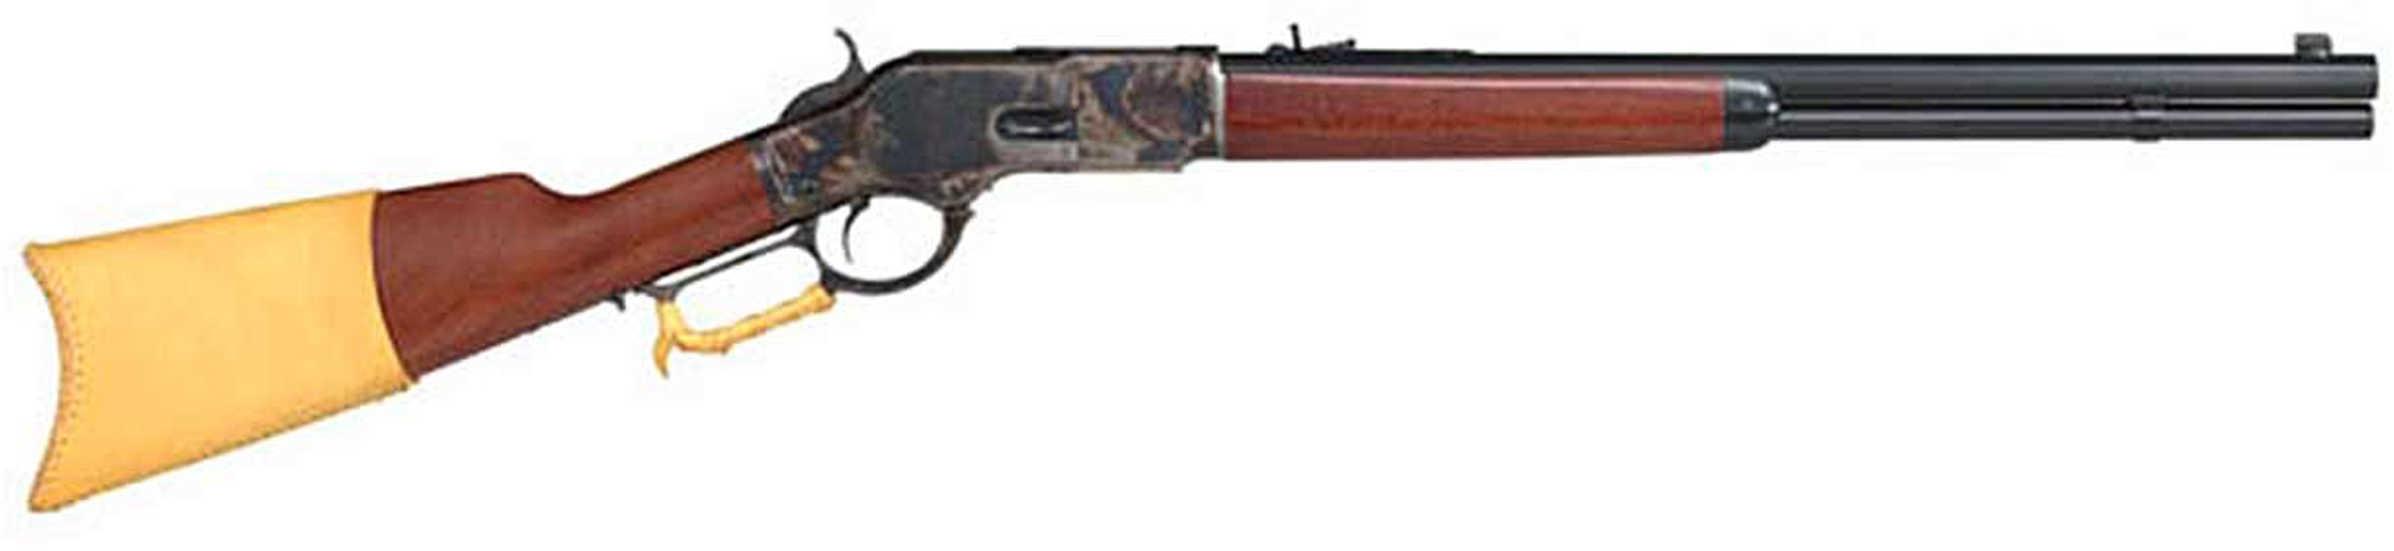 "Taylor's & Company Taylor 1873 Comanchero Lever Action Rifle 45 Long Colt 20"" Octagonal Barrel Buckhorn Rear/Gold Bead Sight Walnut Straight Stock 10-Round Capacity Case Hardened Frame"